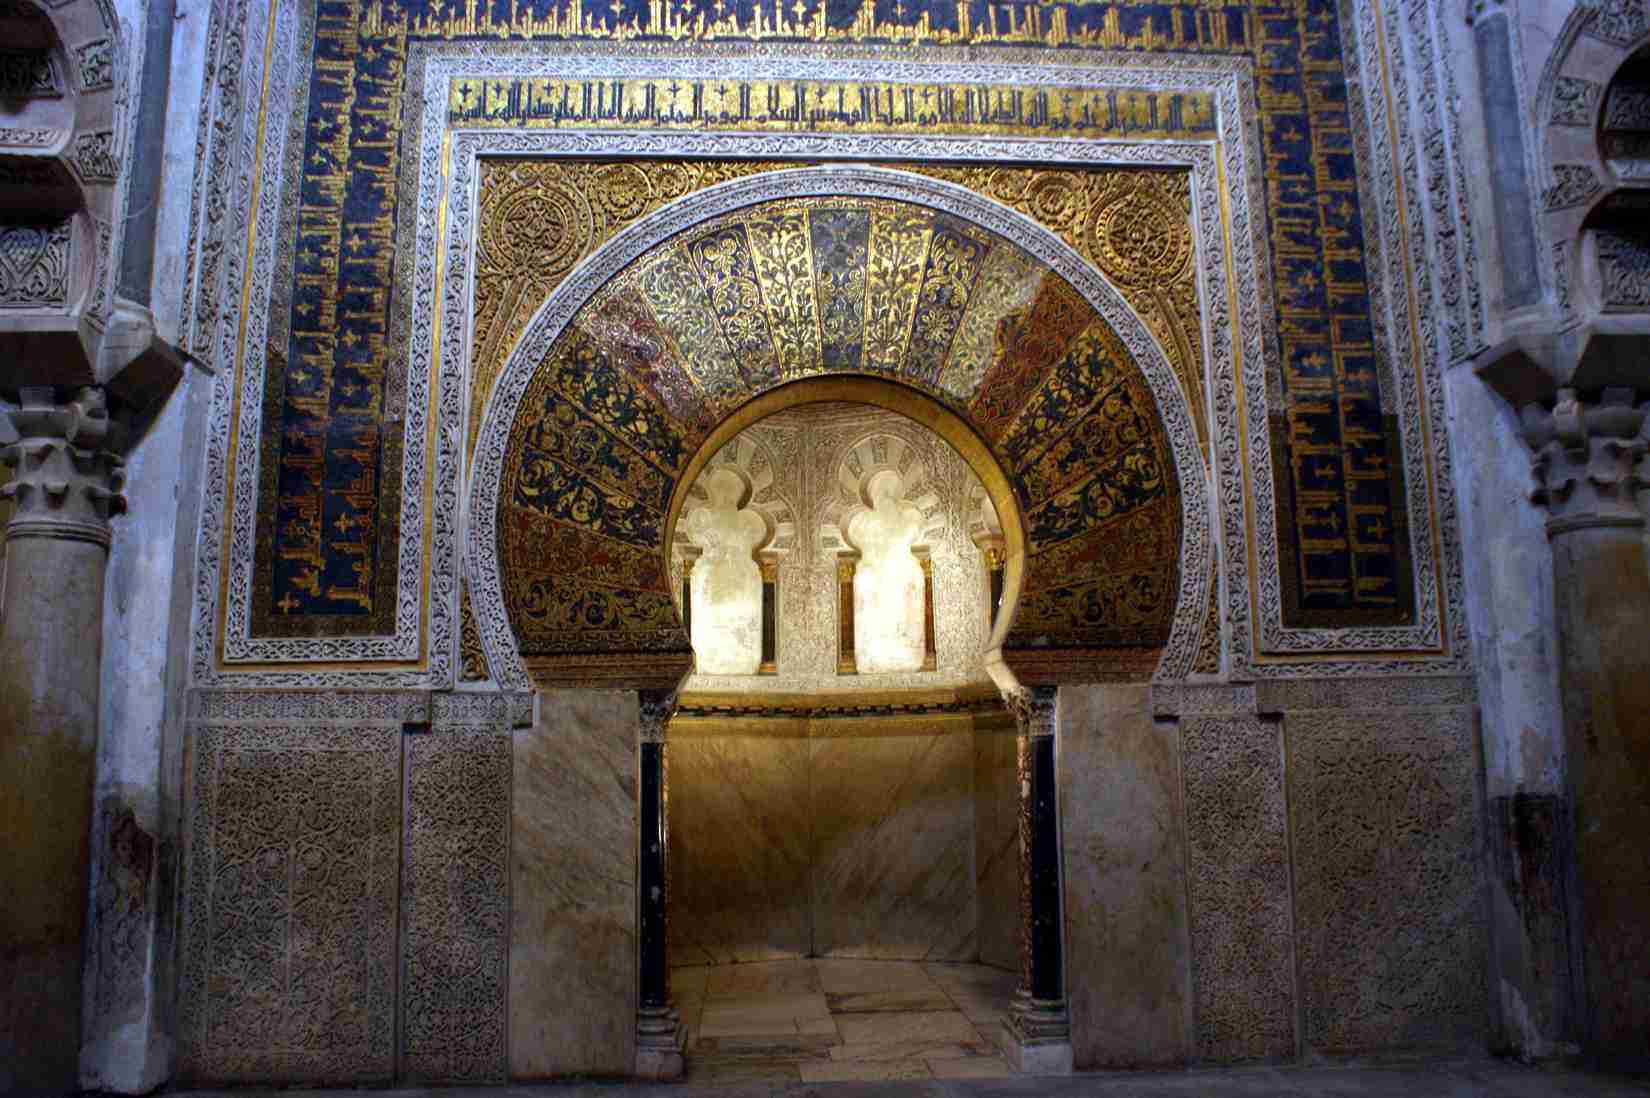 Mirhab de la mezquita de c rdoba secretolivo - Mezquita de cordoba de noche ...